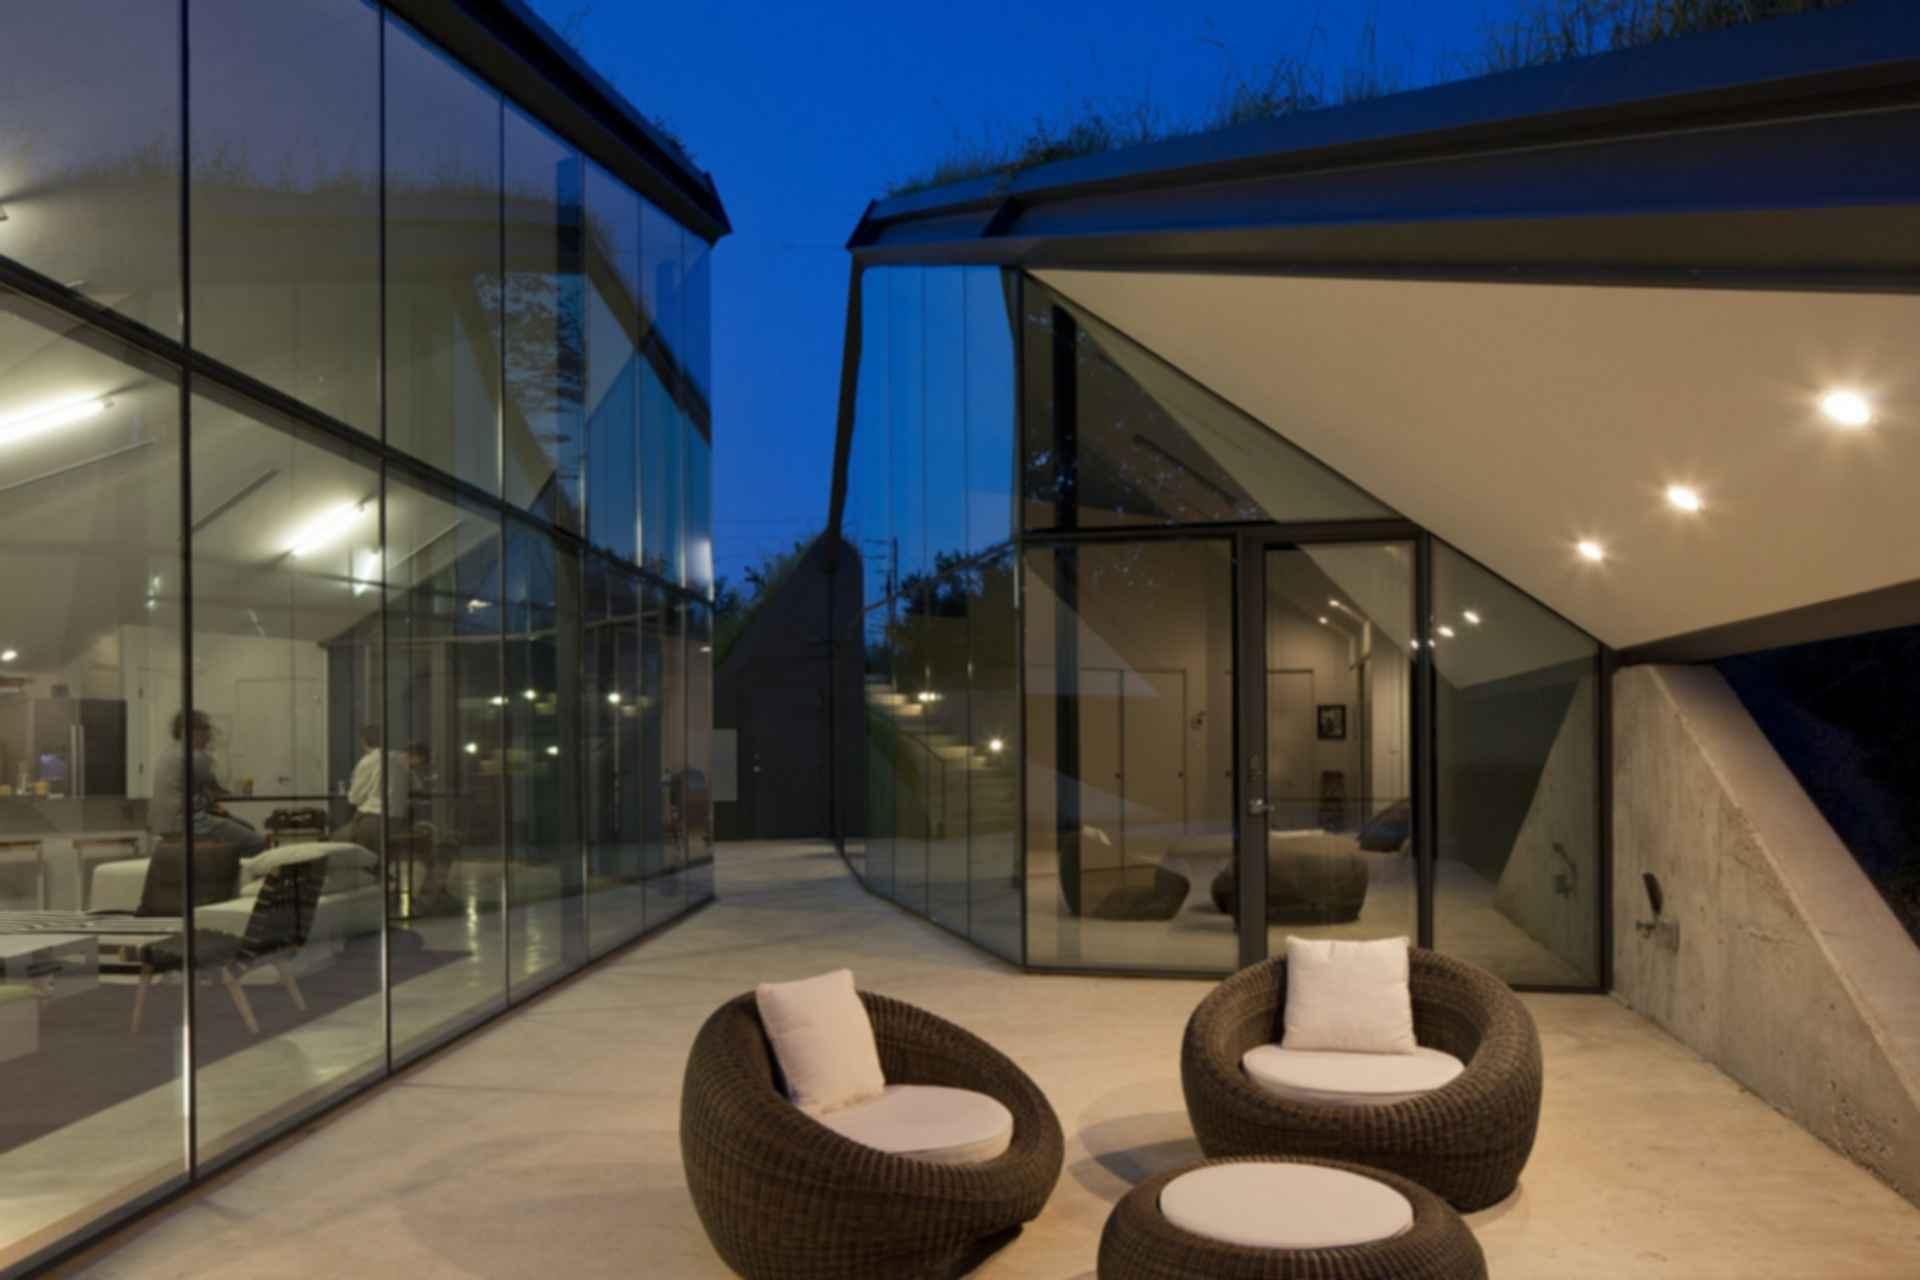 Edgeland House - Exterior/Outdoor Area